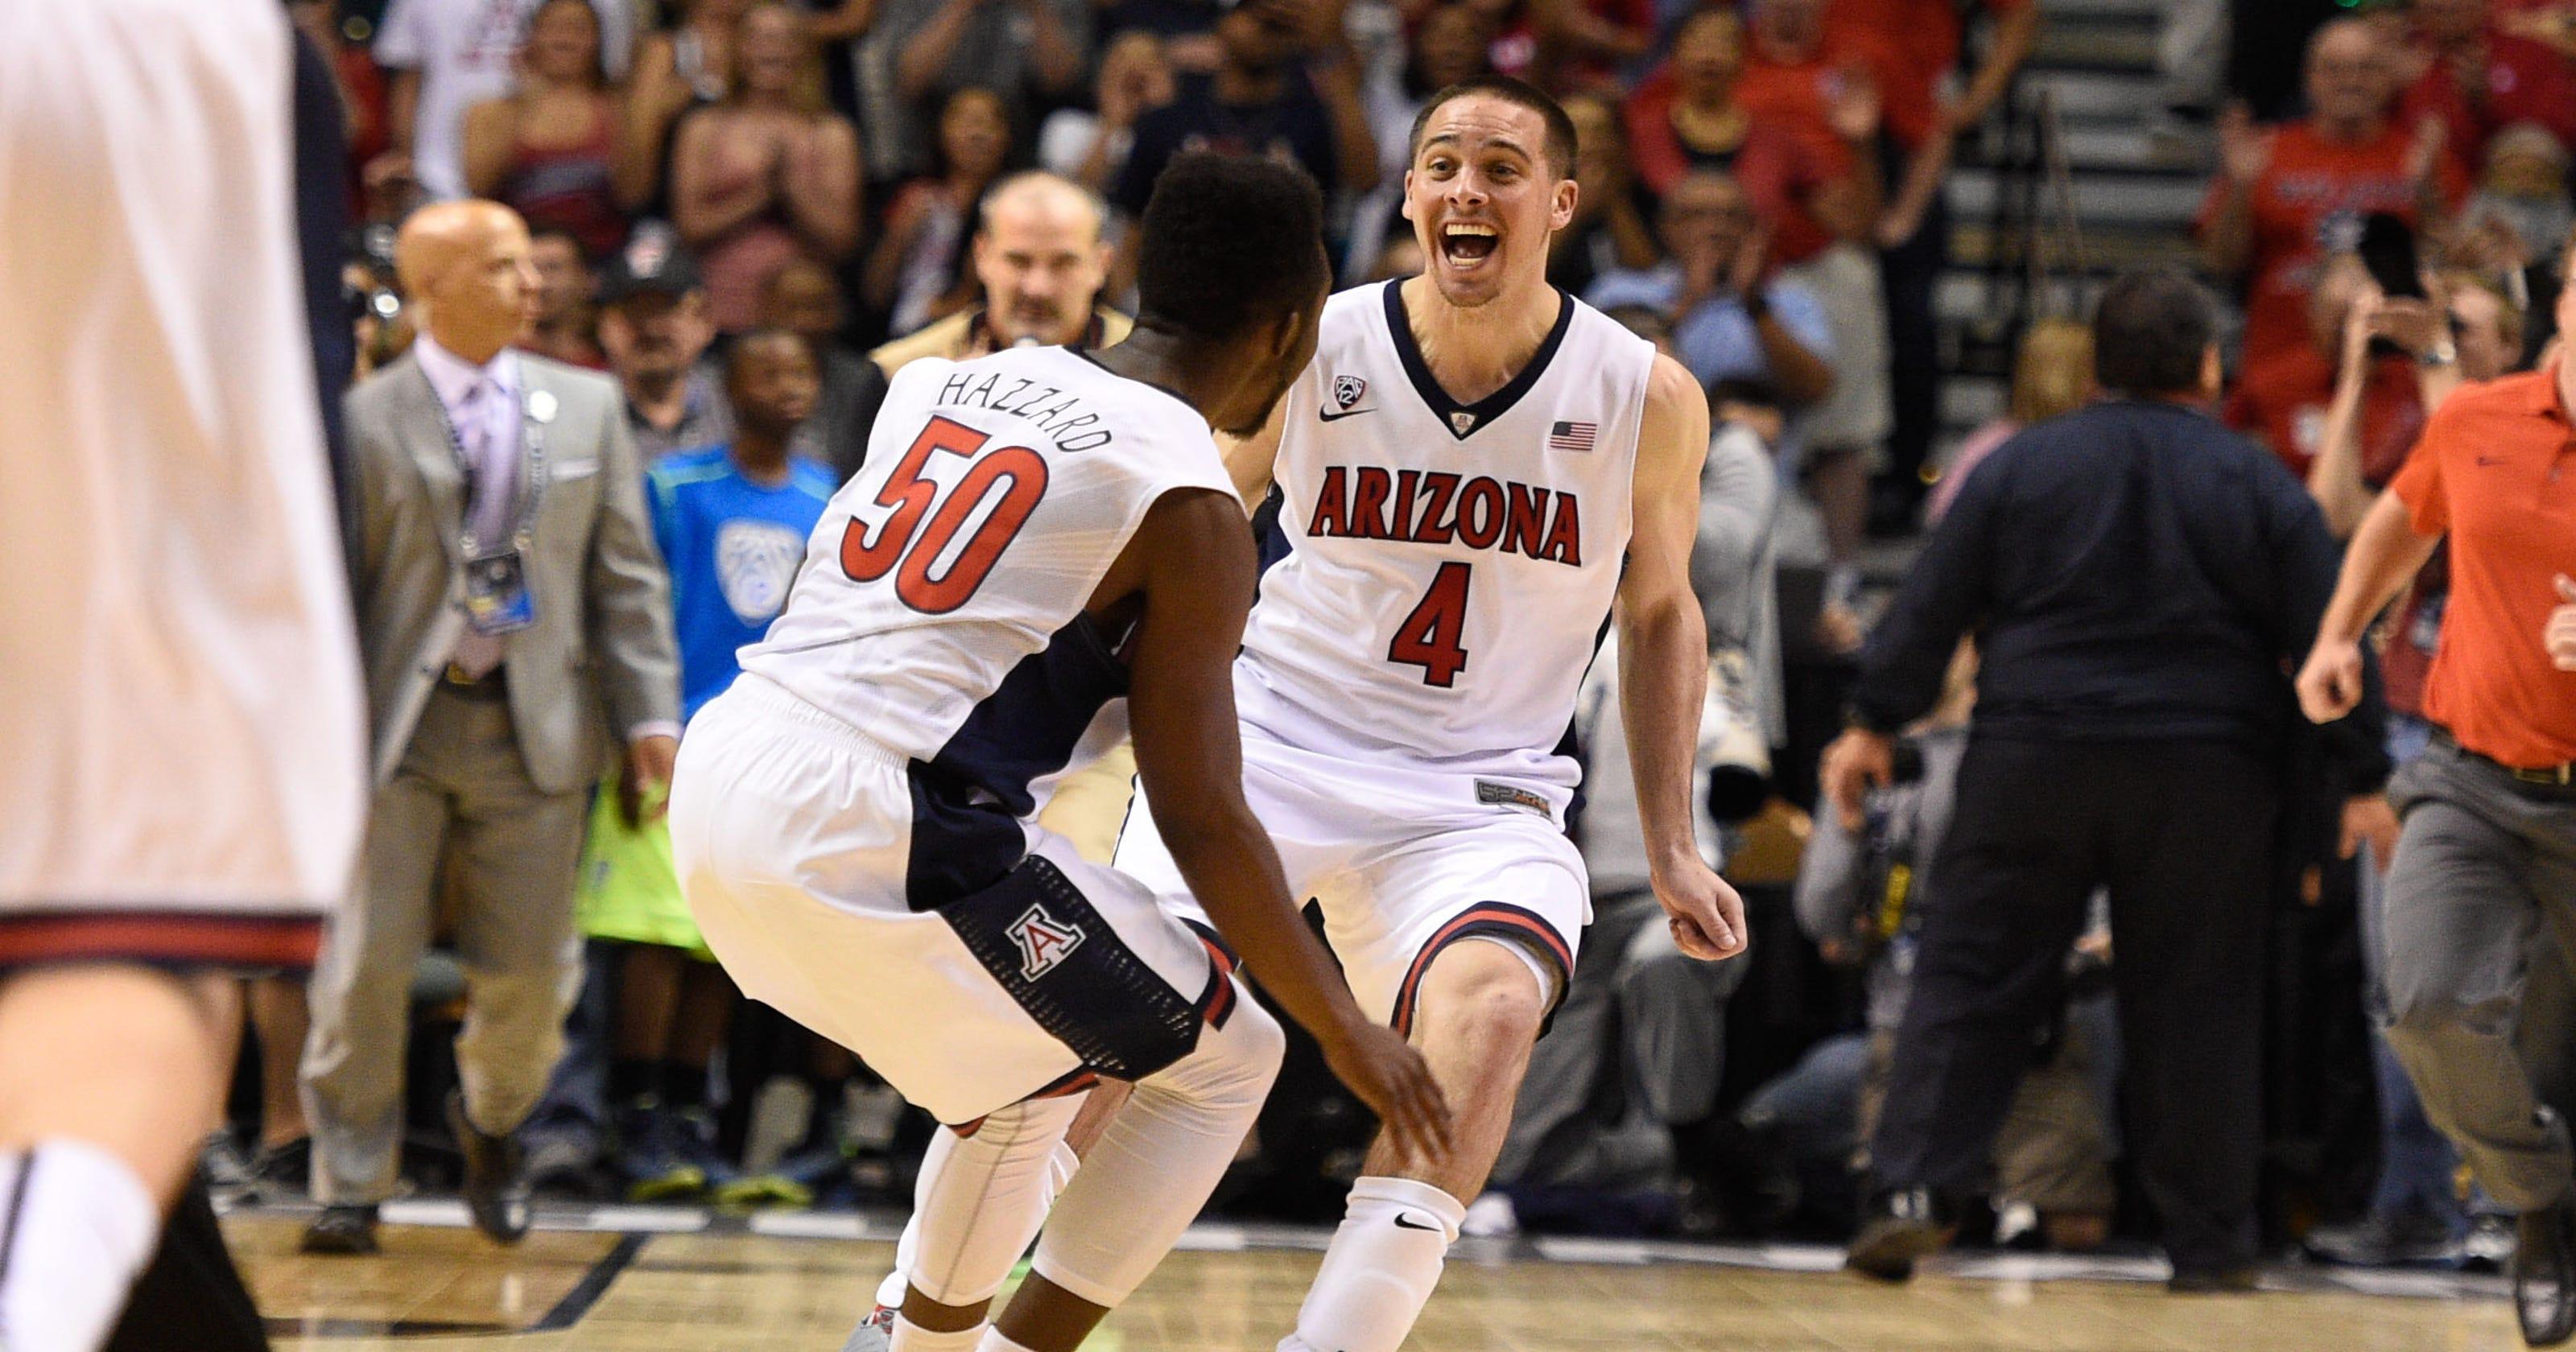 Arizona Men's Basketball Draws No. 2 Seed In West Region